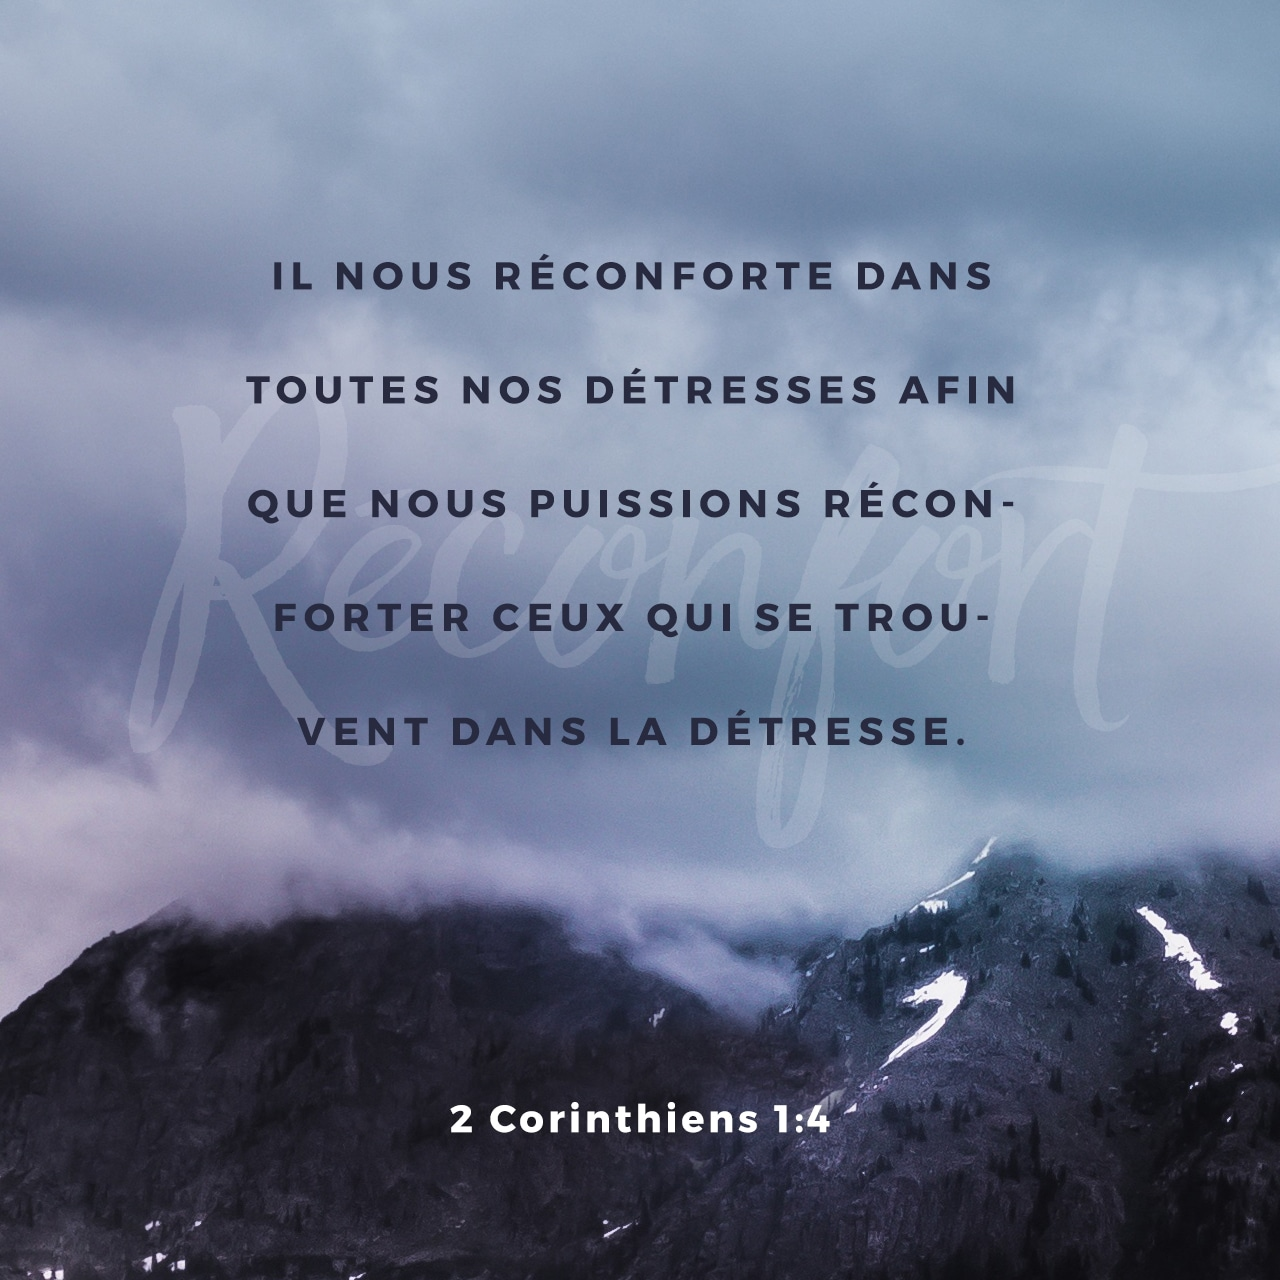 2 Corinthians 1:4 (JPG)